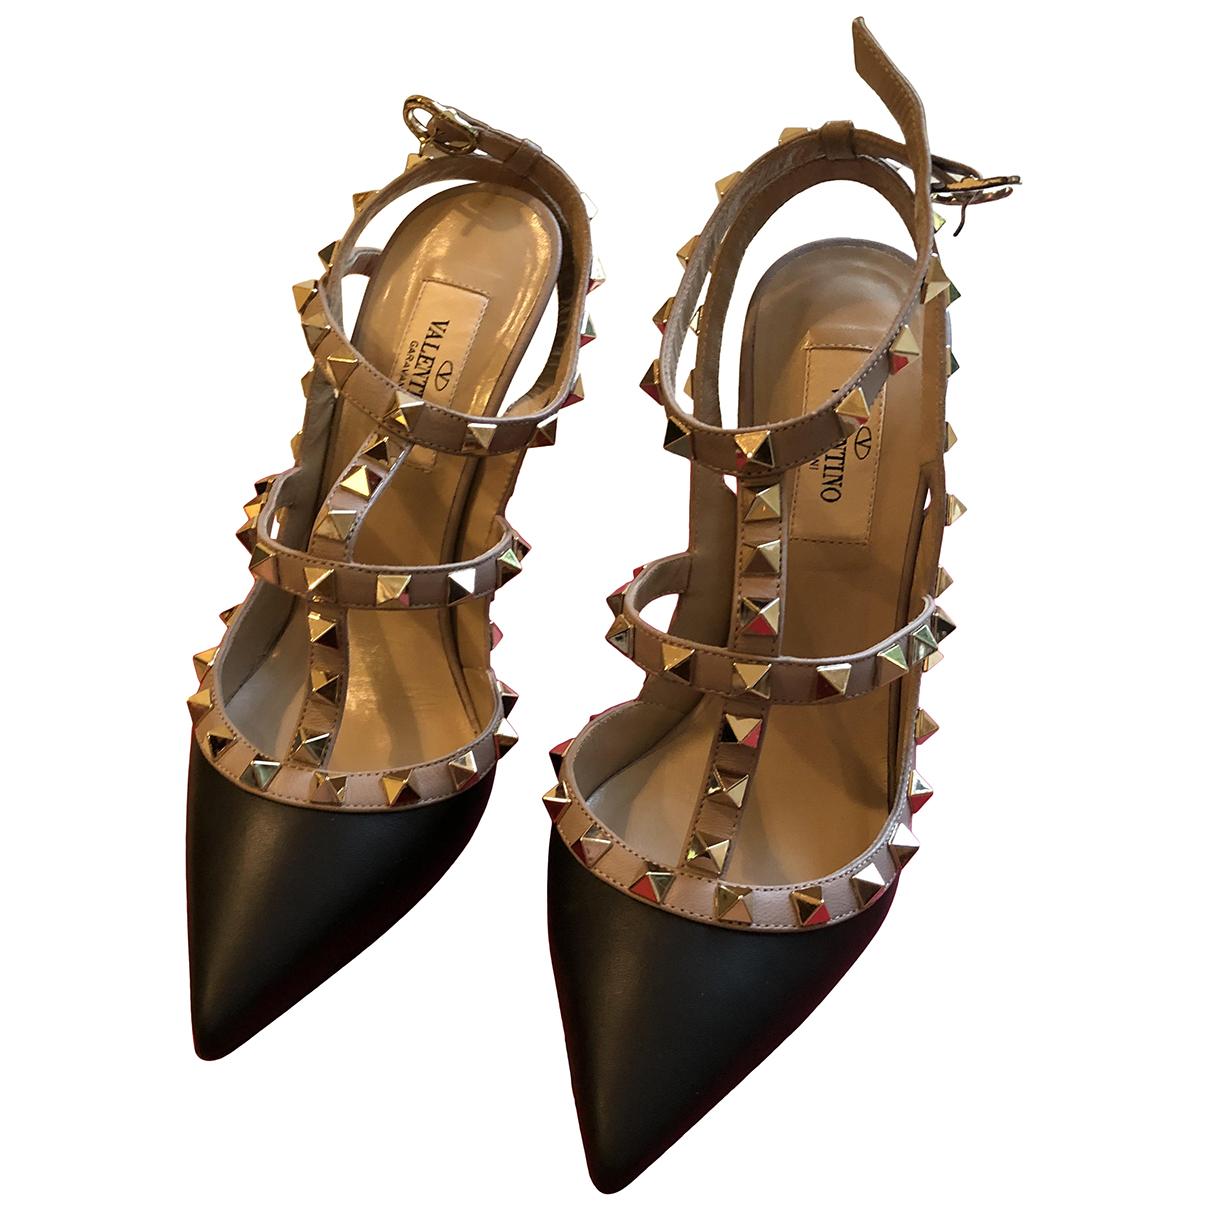 Valentino Garavani Rockstud Black Leather Heels for Women 36.5 EU